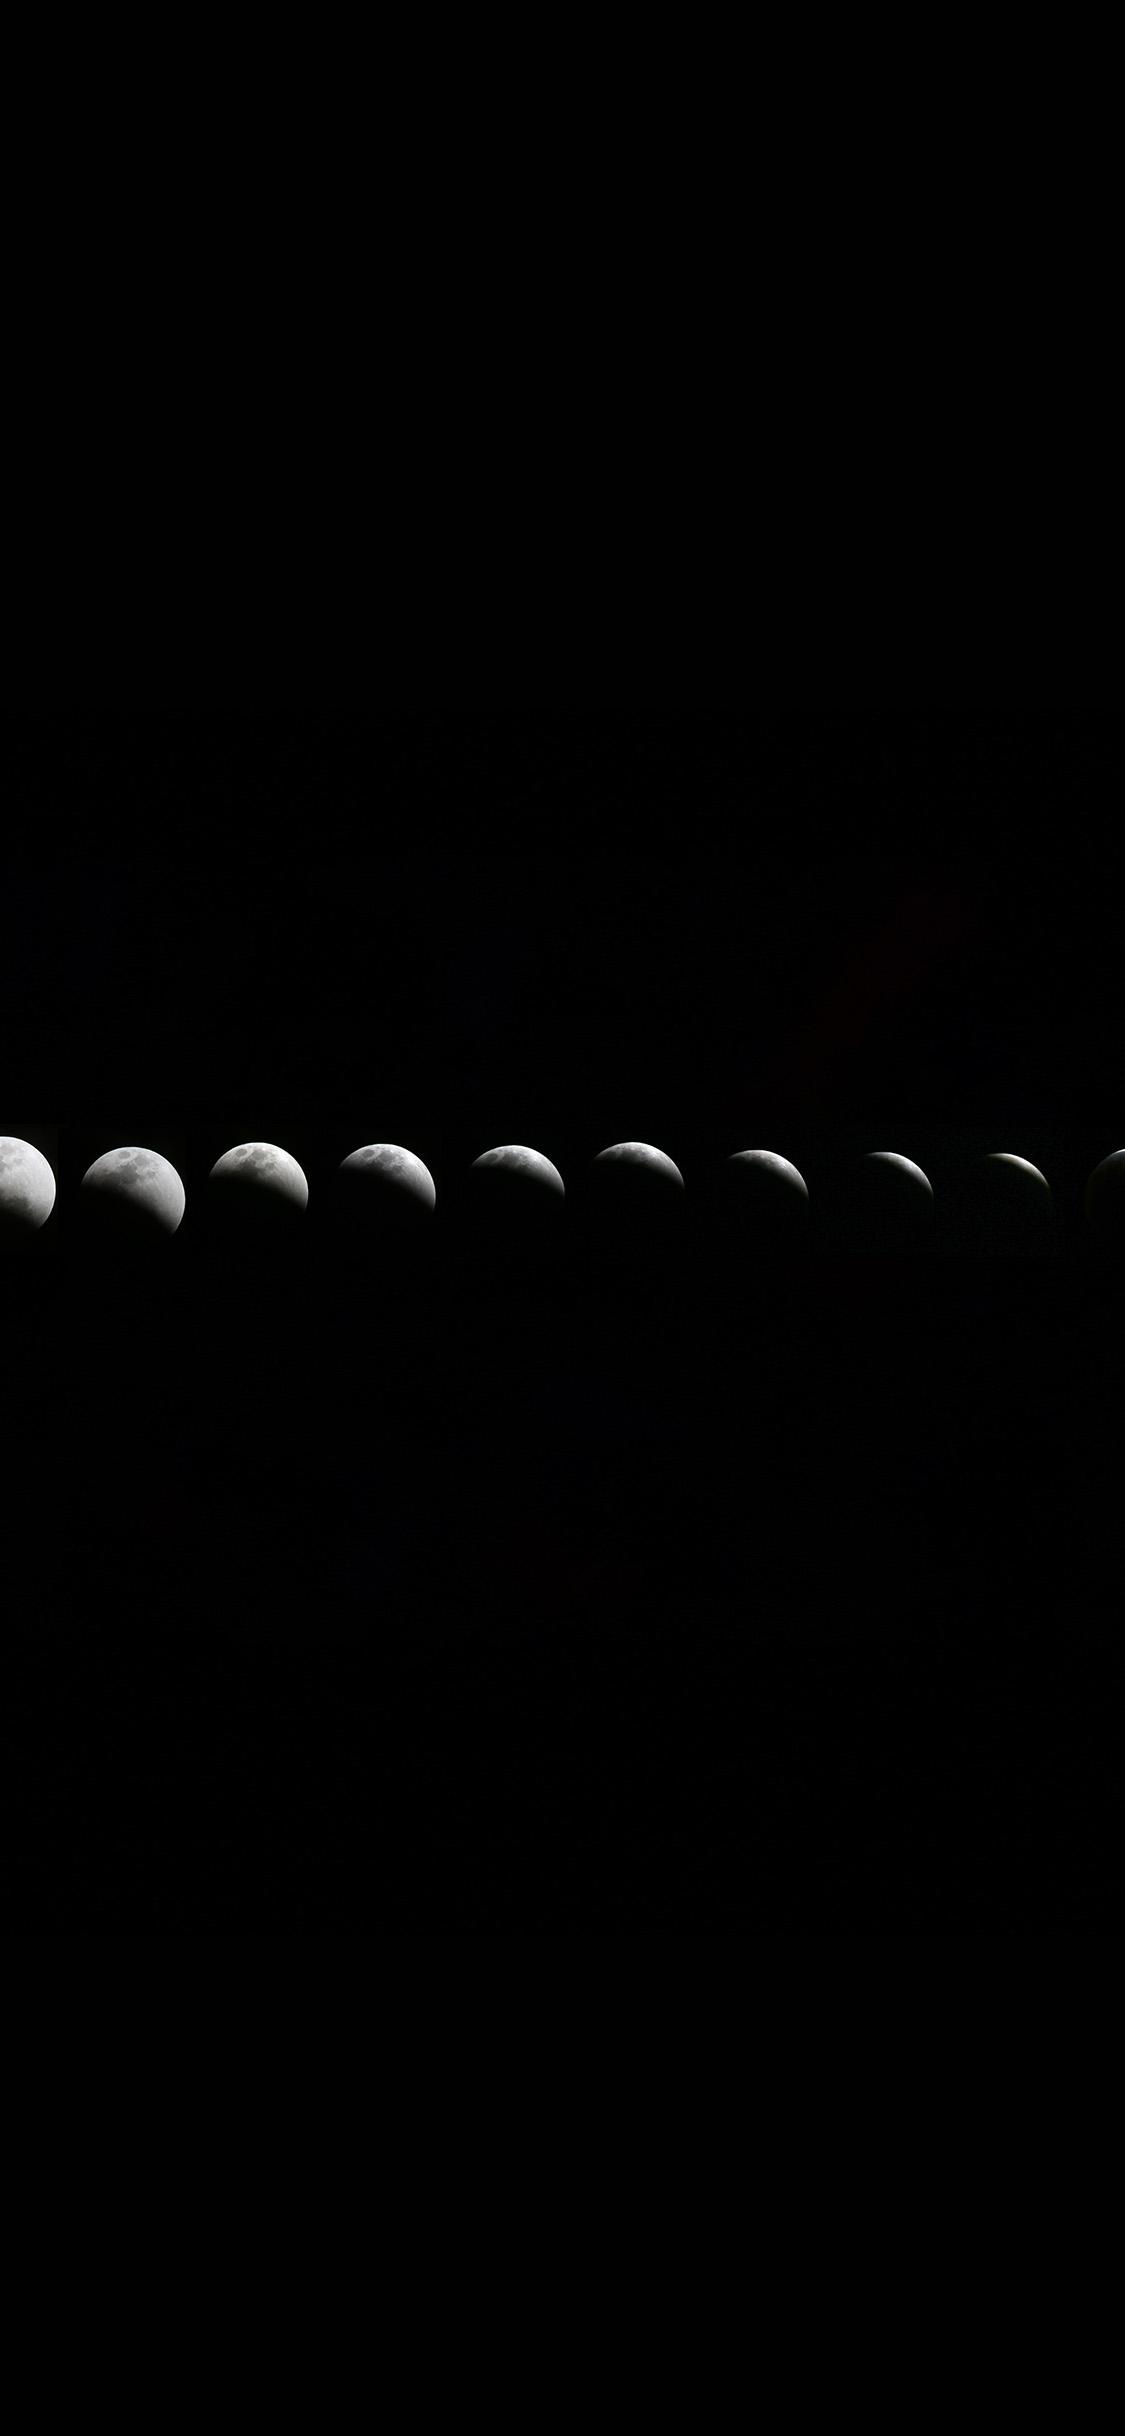 Iphonexpapers Com Iphone X Wallpaper Nw50 Moon Fade Lunar Nature Space Dark